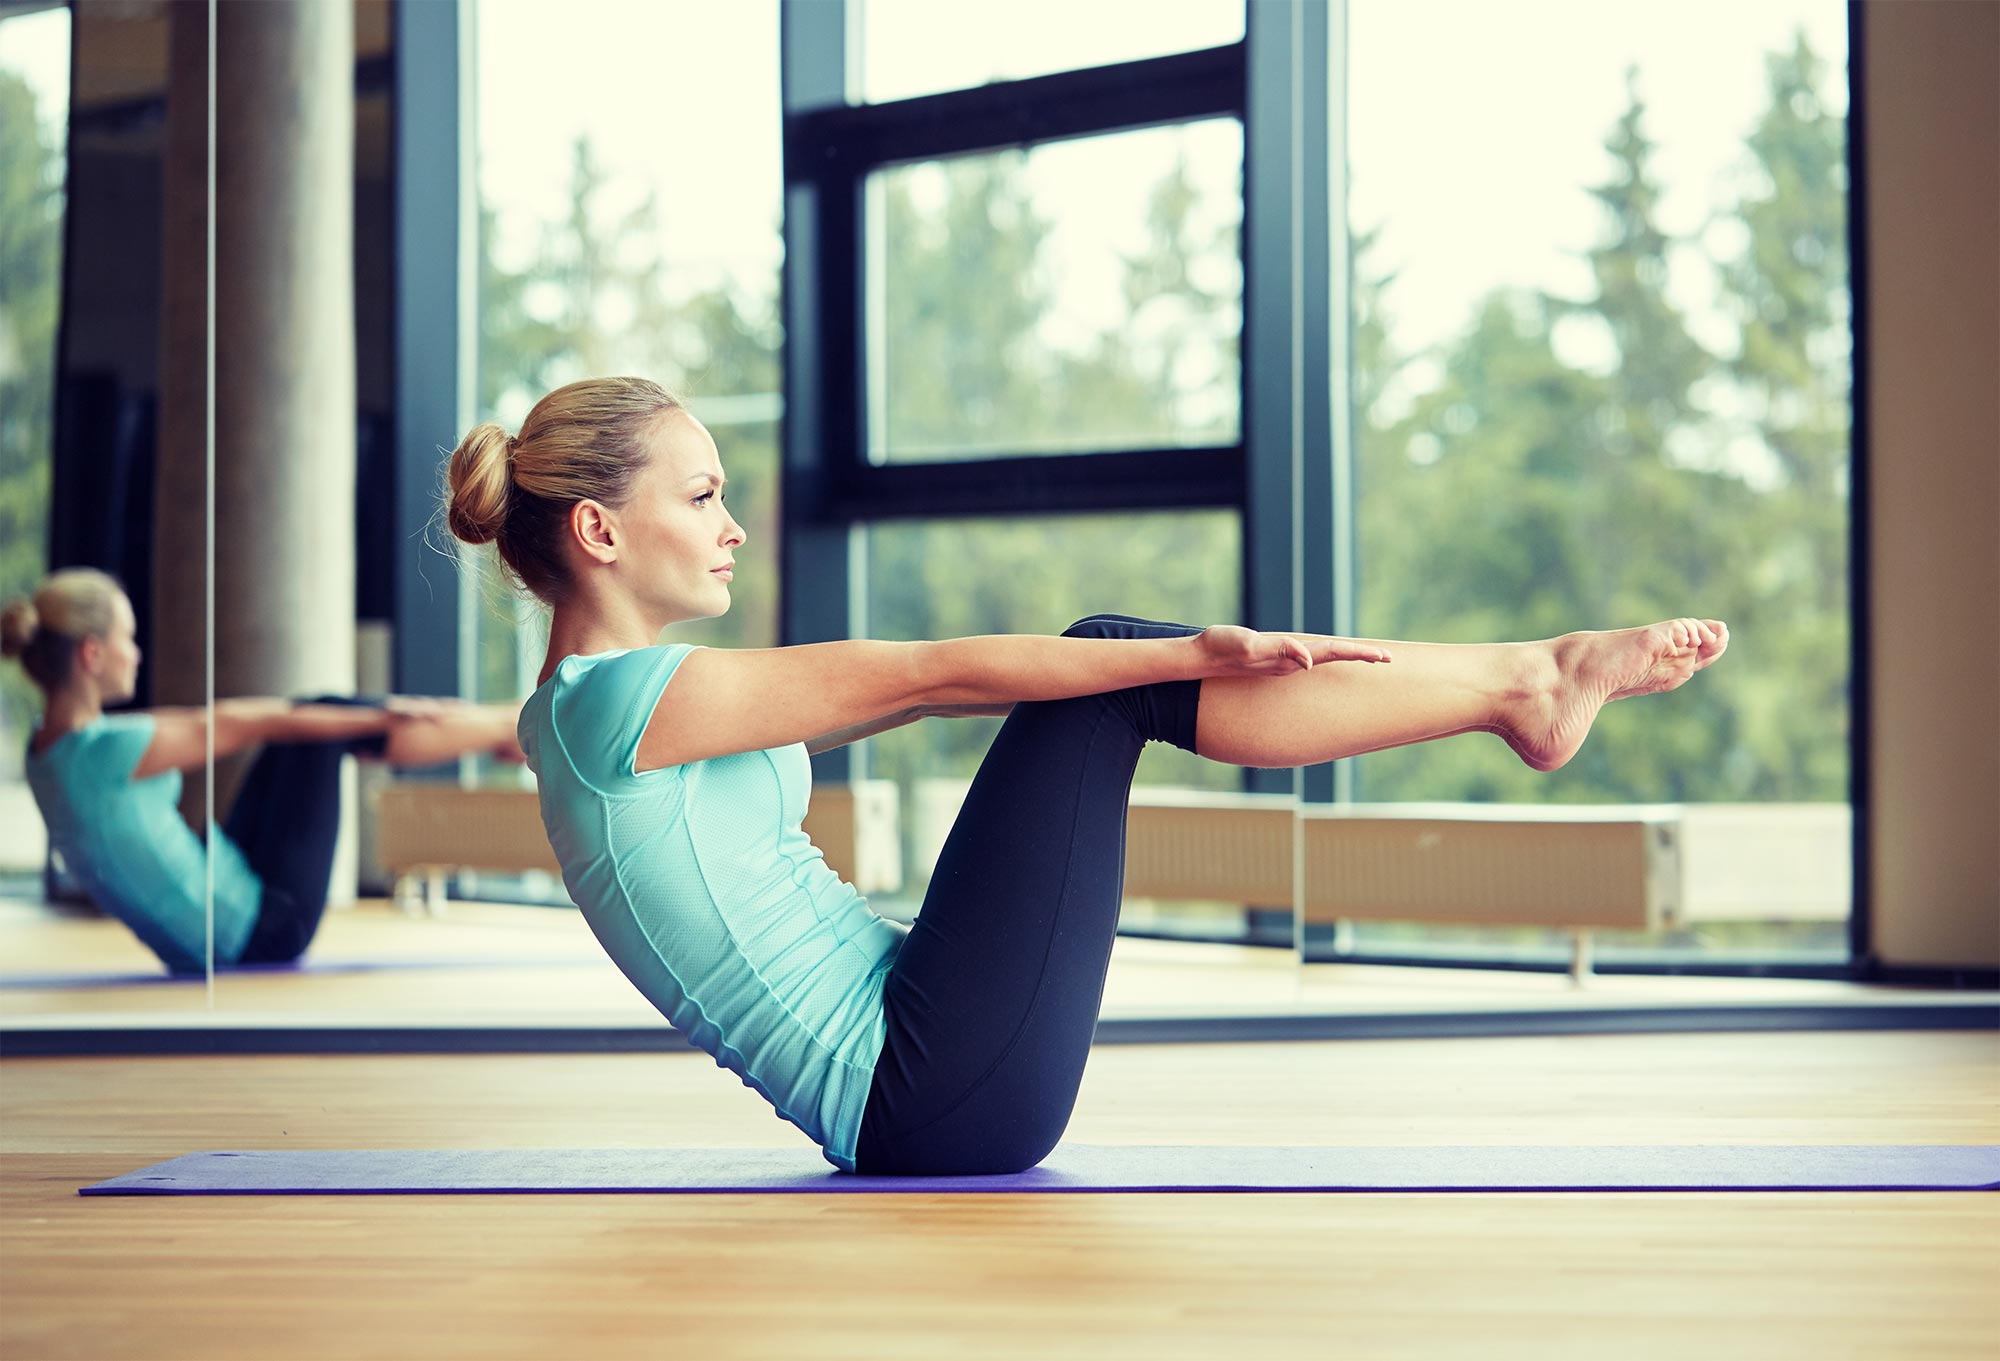 Pilates Black and white image